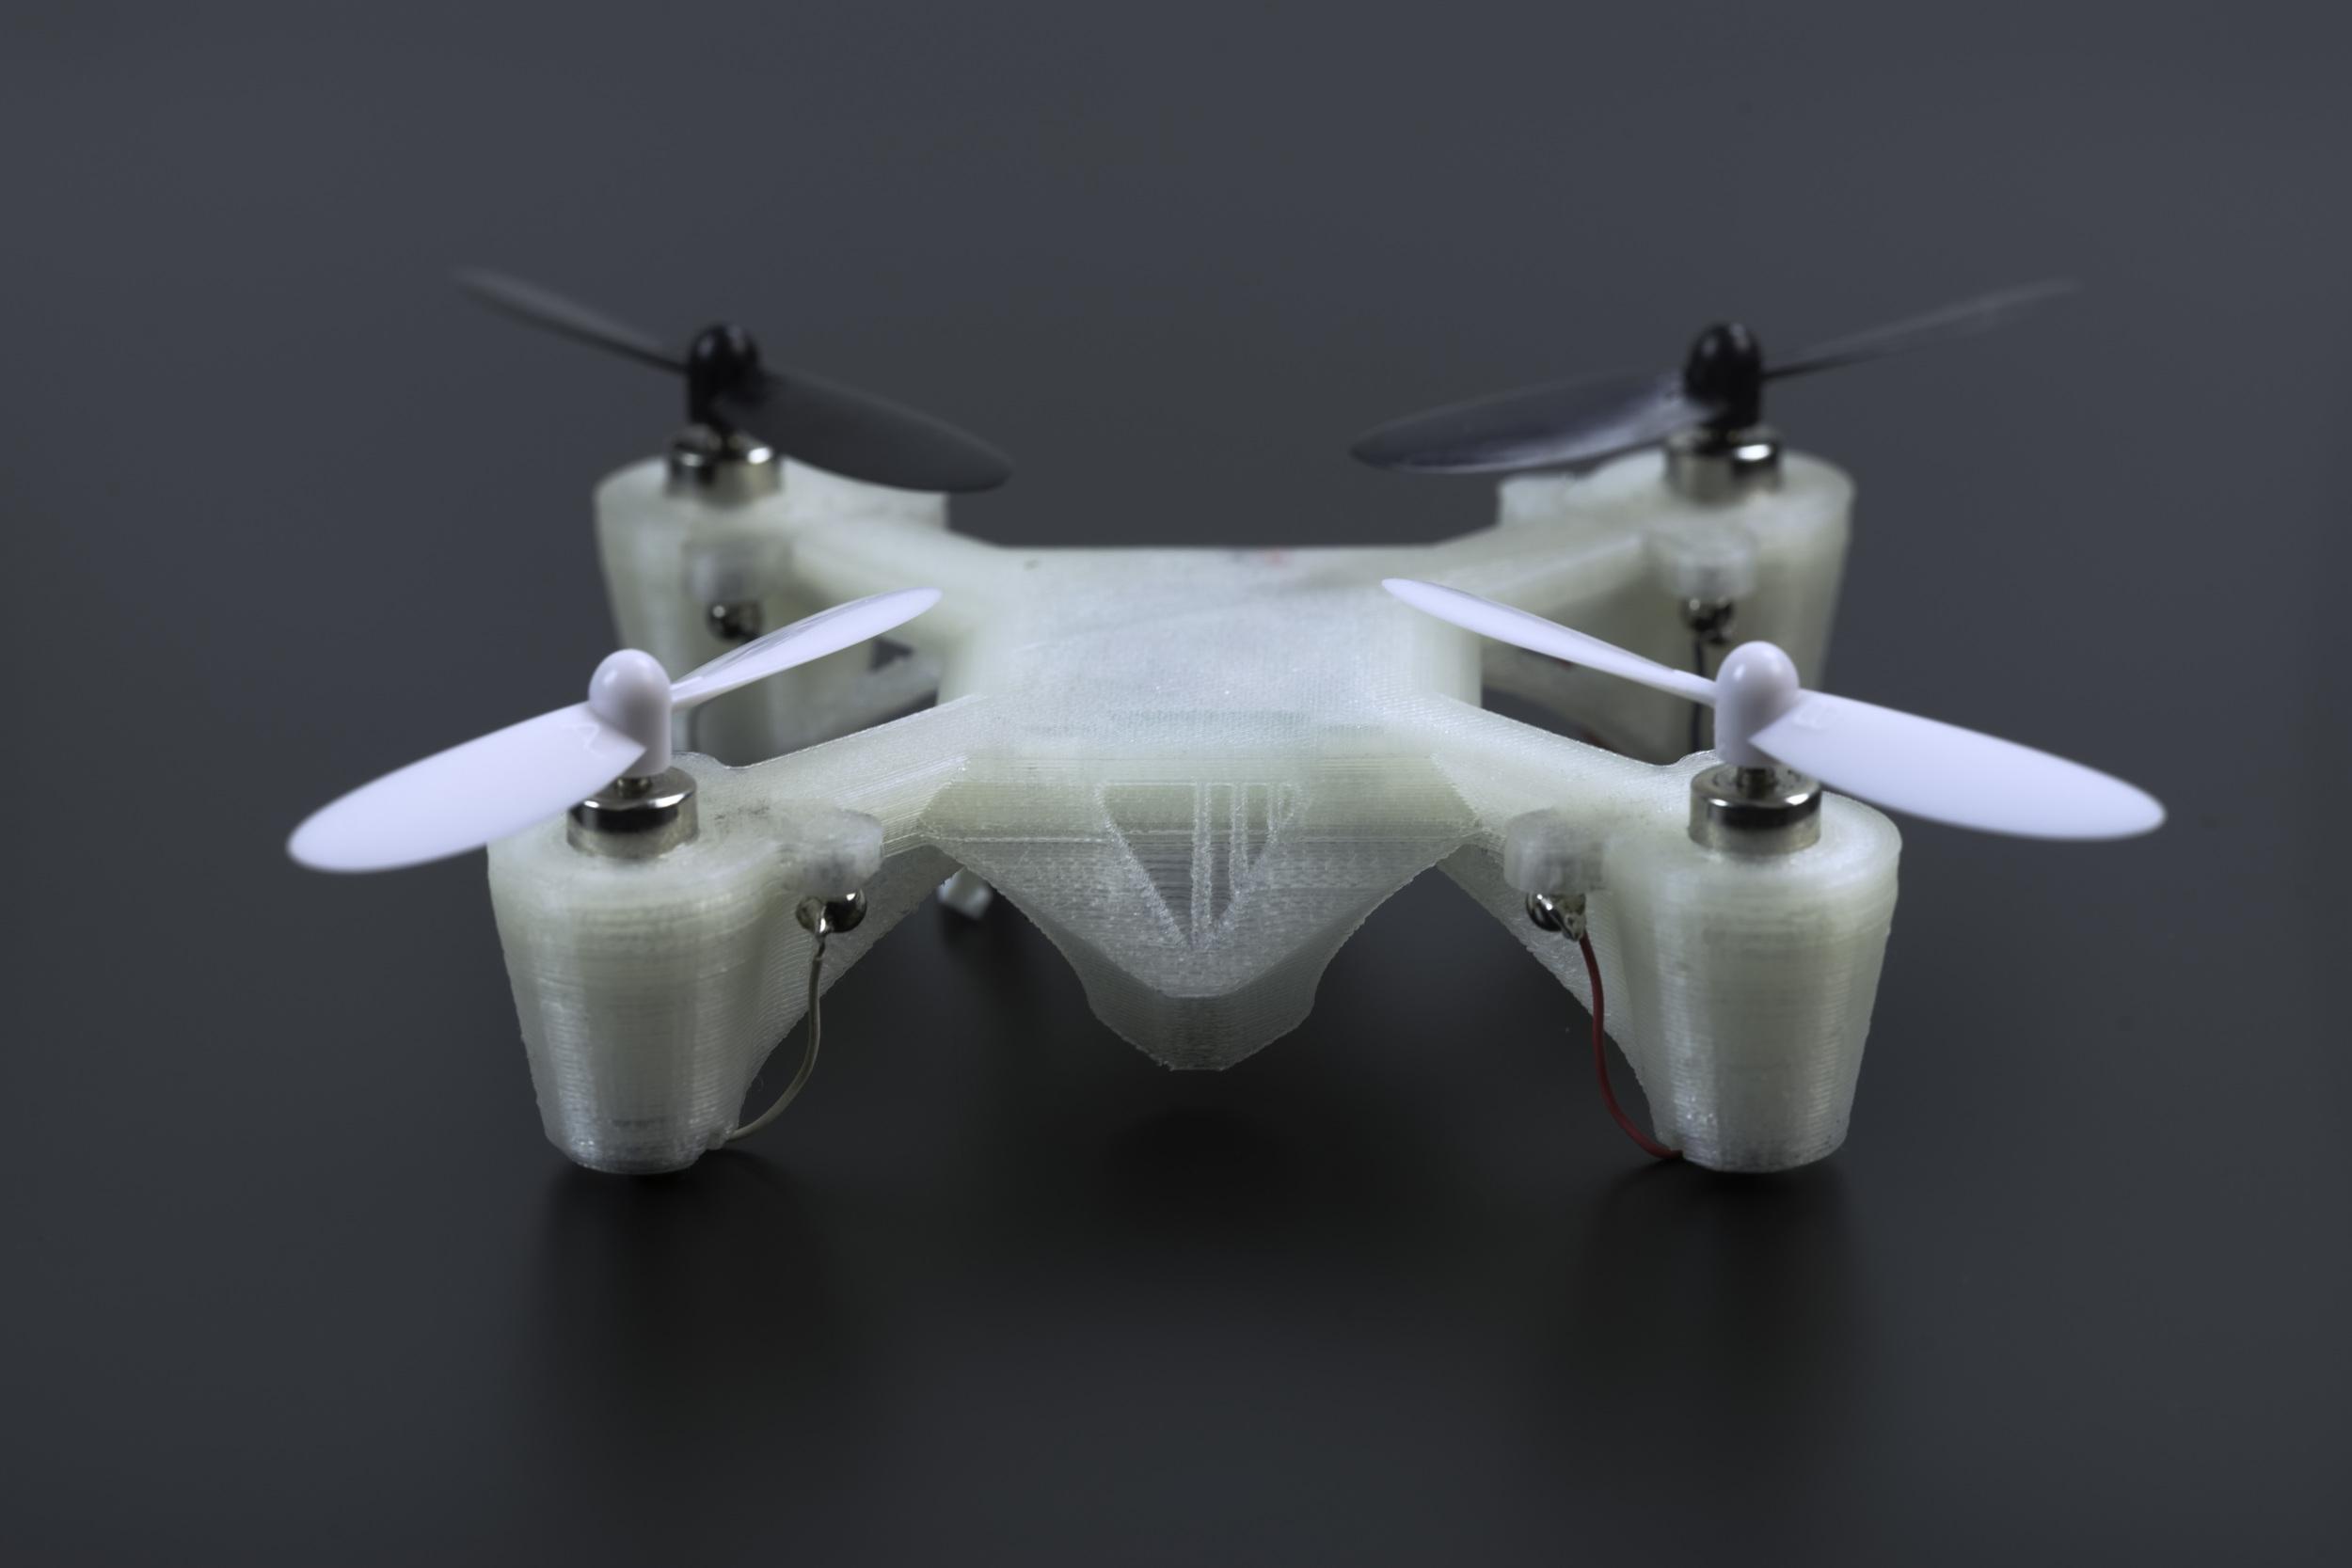 Quadcopter-DSC07918-Edit.jpg